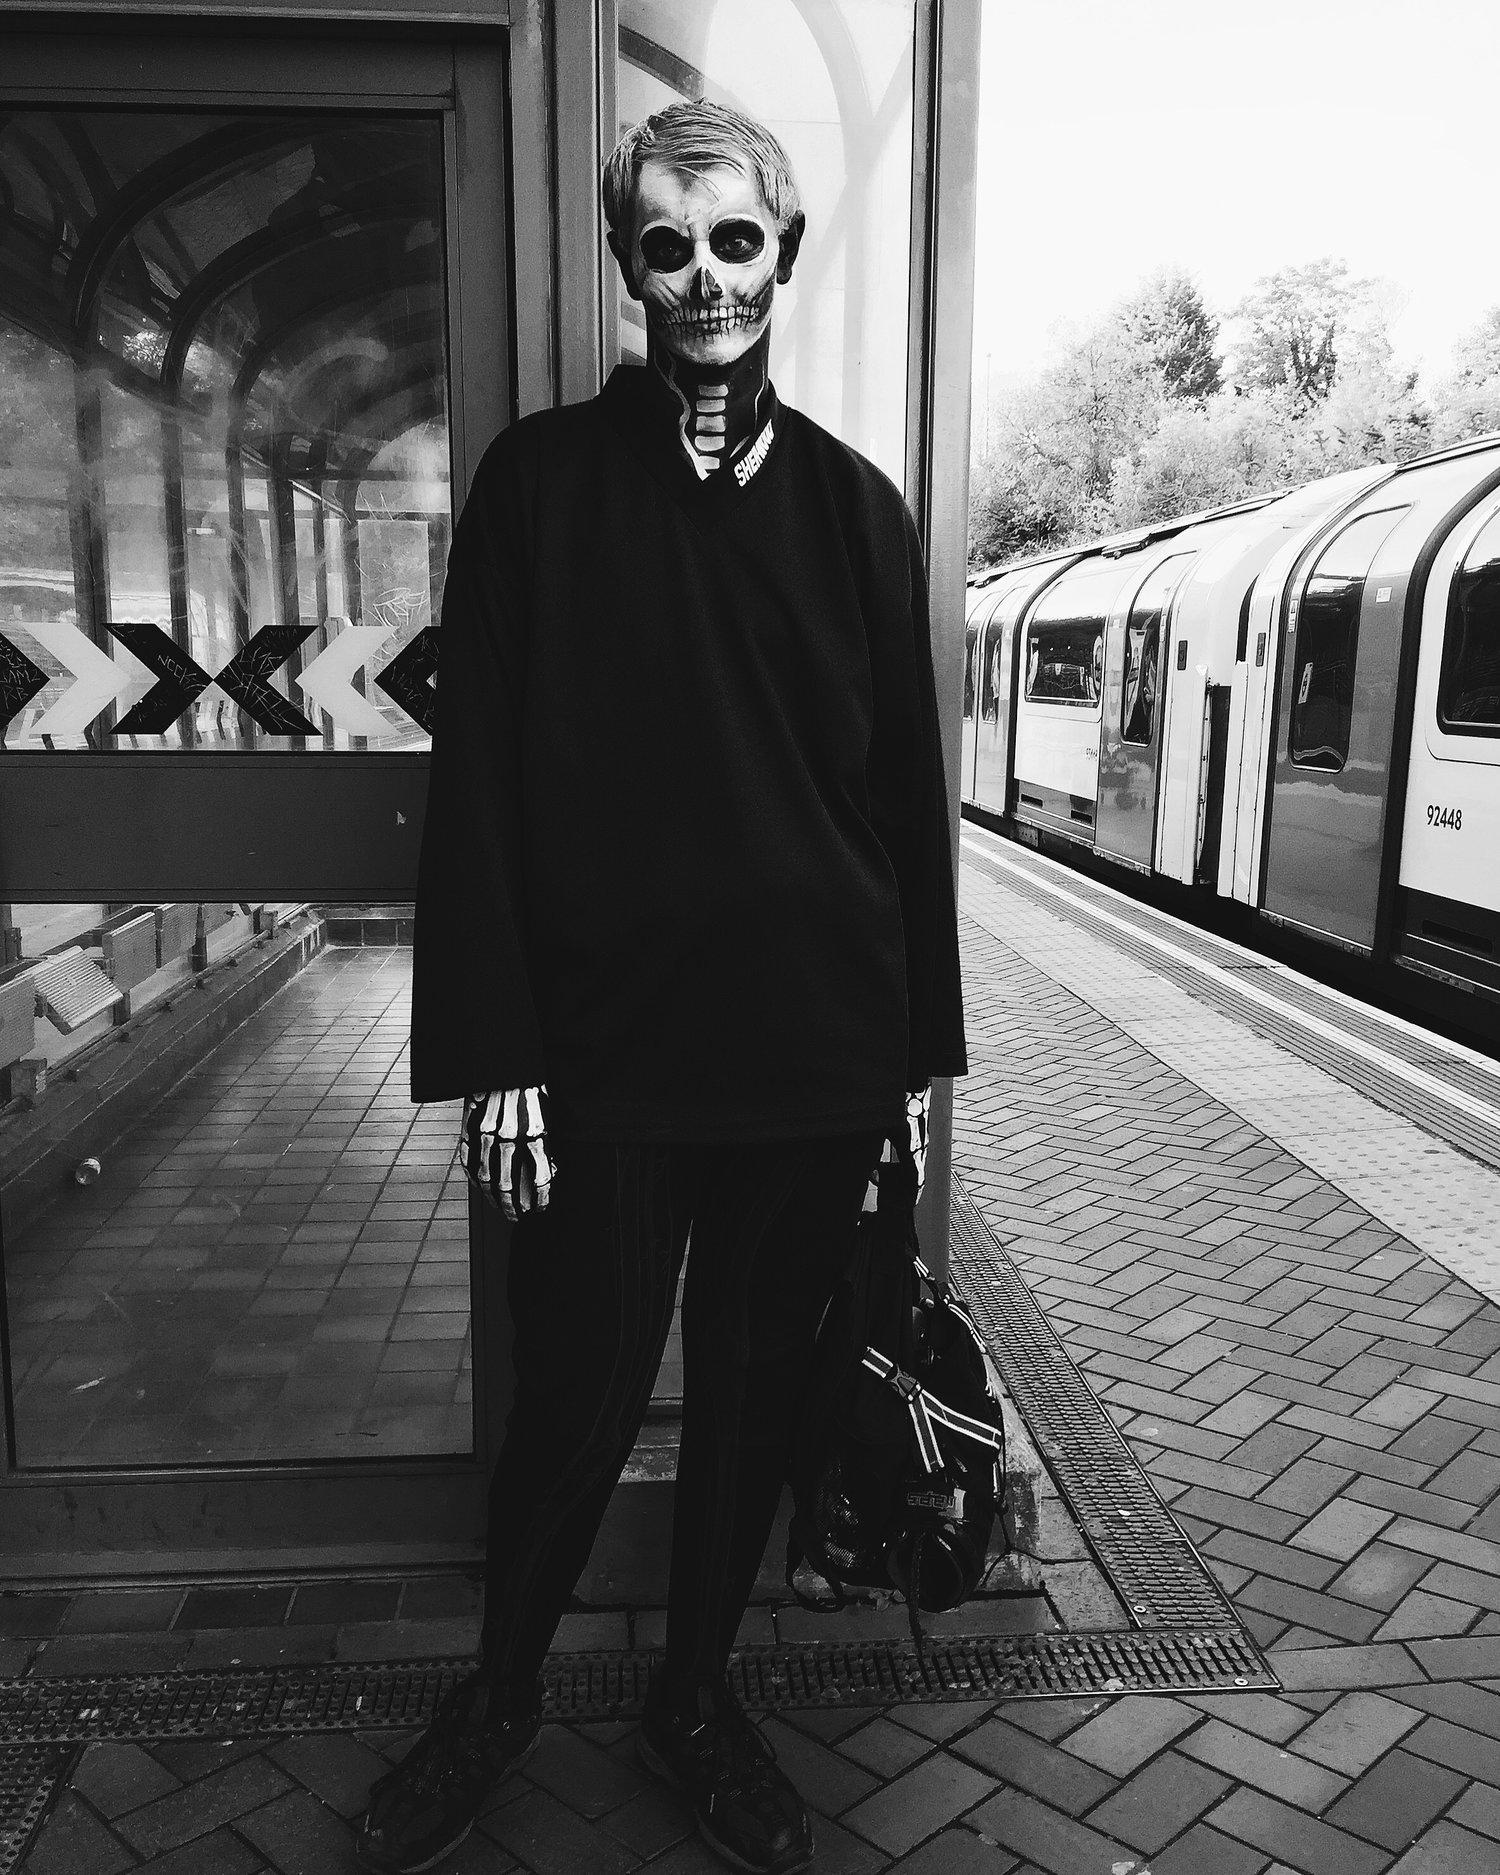 Halloween in London.